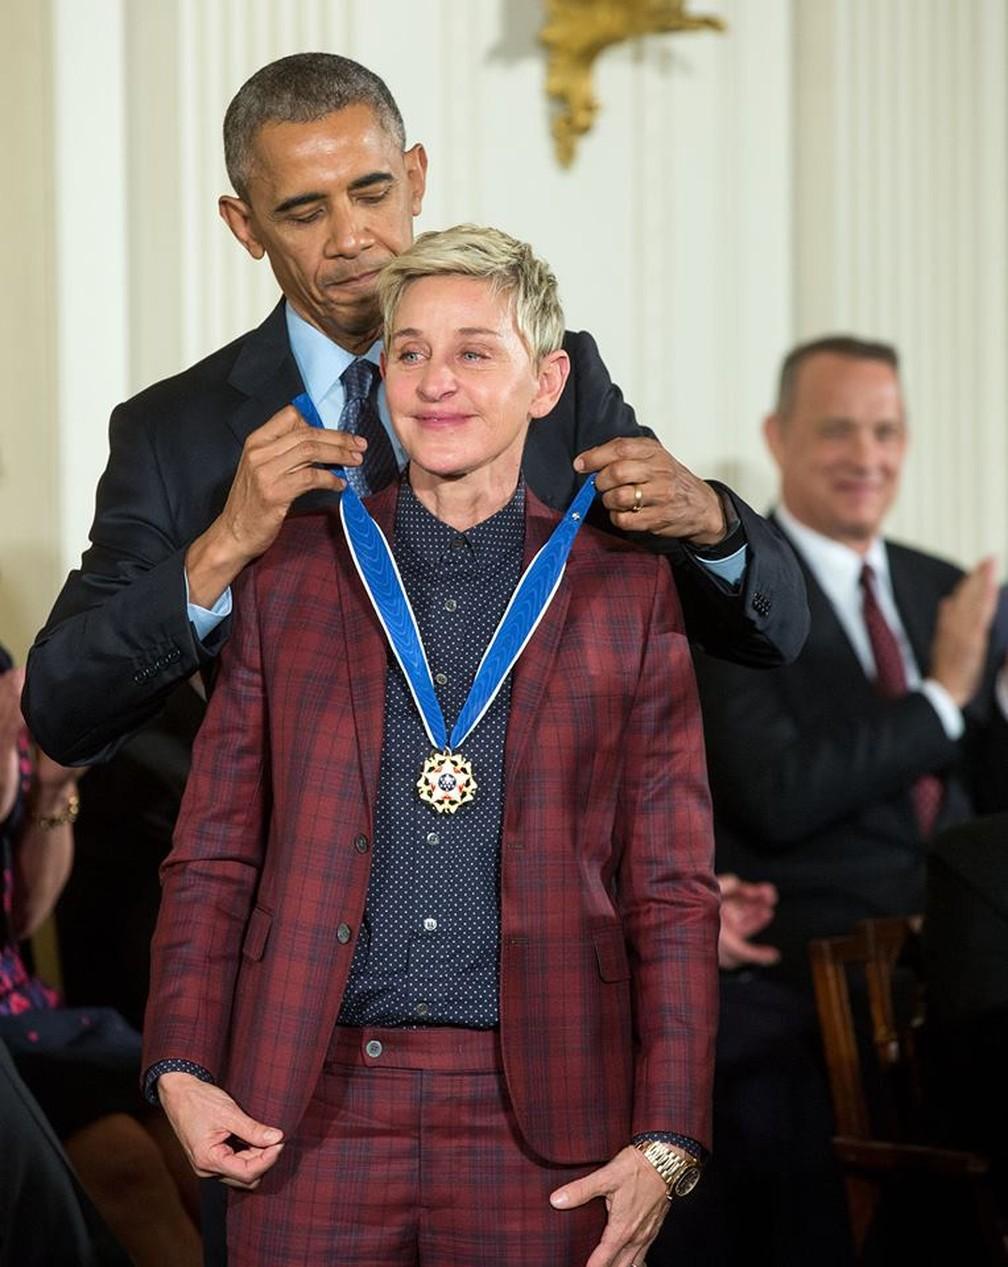 A humorista Ellen DeGeneres recebe Medalha da Liberdade de Barack Obama nesta quarta-feira (23) — Foto: Official White House Photo by Amanda Lucidon